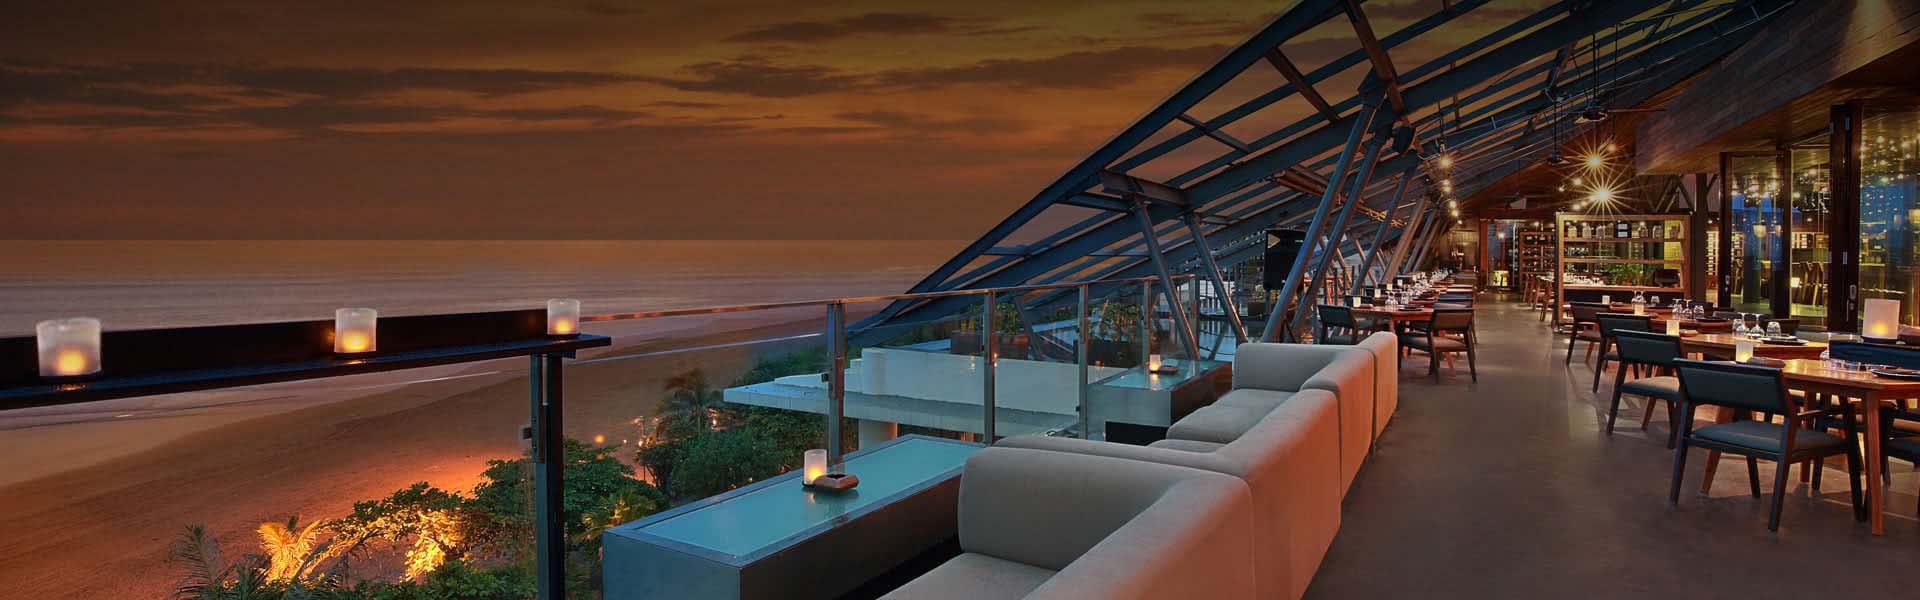 gorgeous rooftop bar moonlite bai